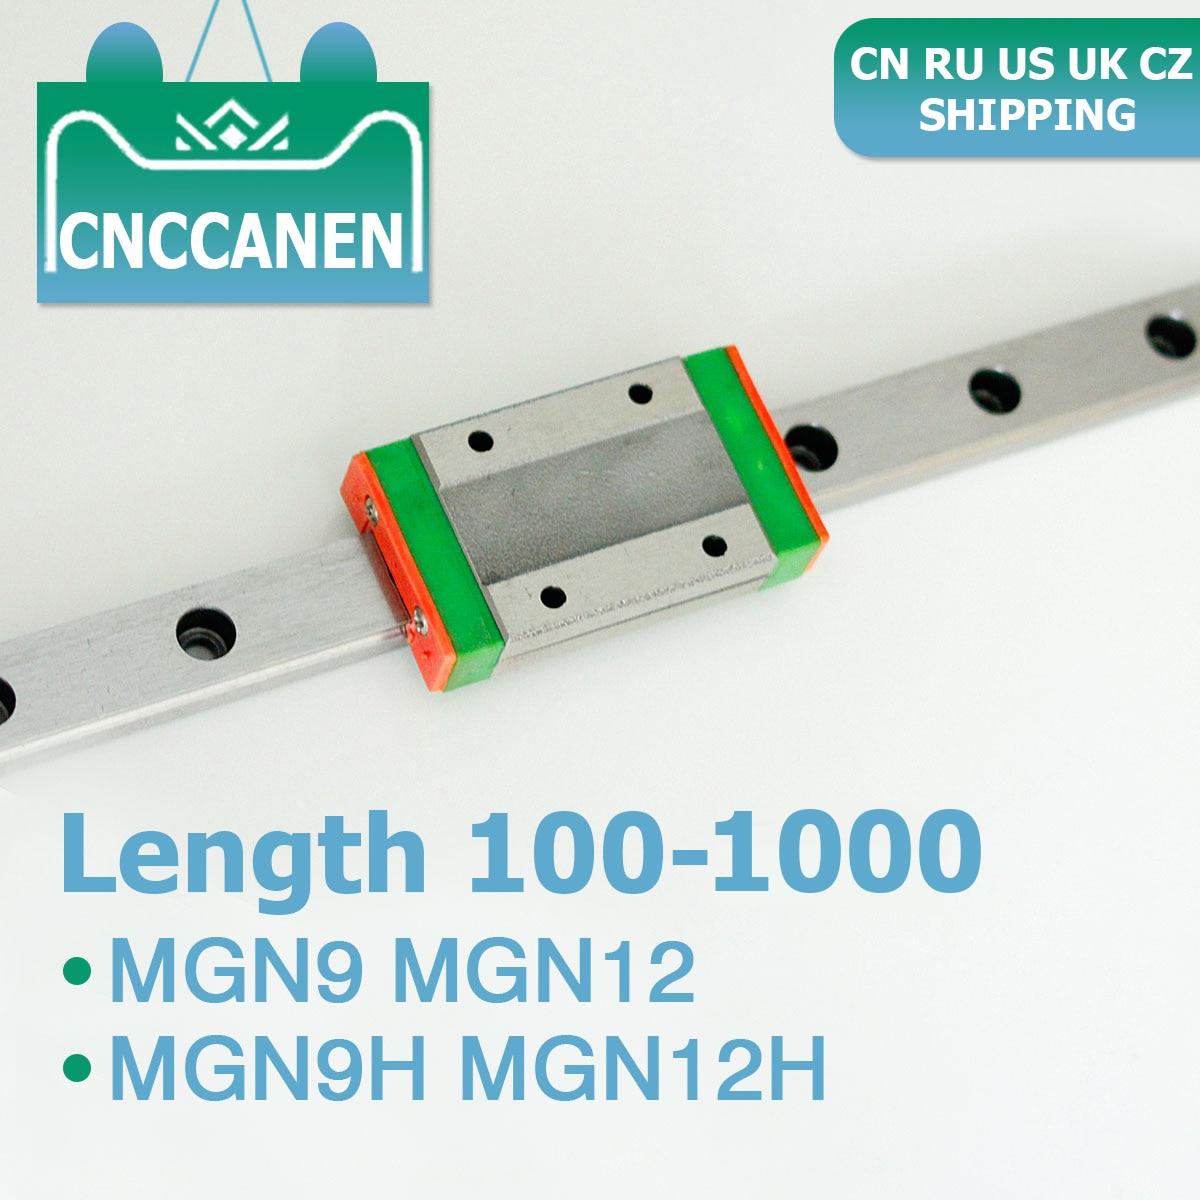 Cnc Lineaire Geleiderail MGN12 MGN9 MGN9H MGN12H 100-1000 Mm Mini Lineaire Geleiderail Slide Blok Voor 3D printer Ru Uk Ons Cz Verzending